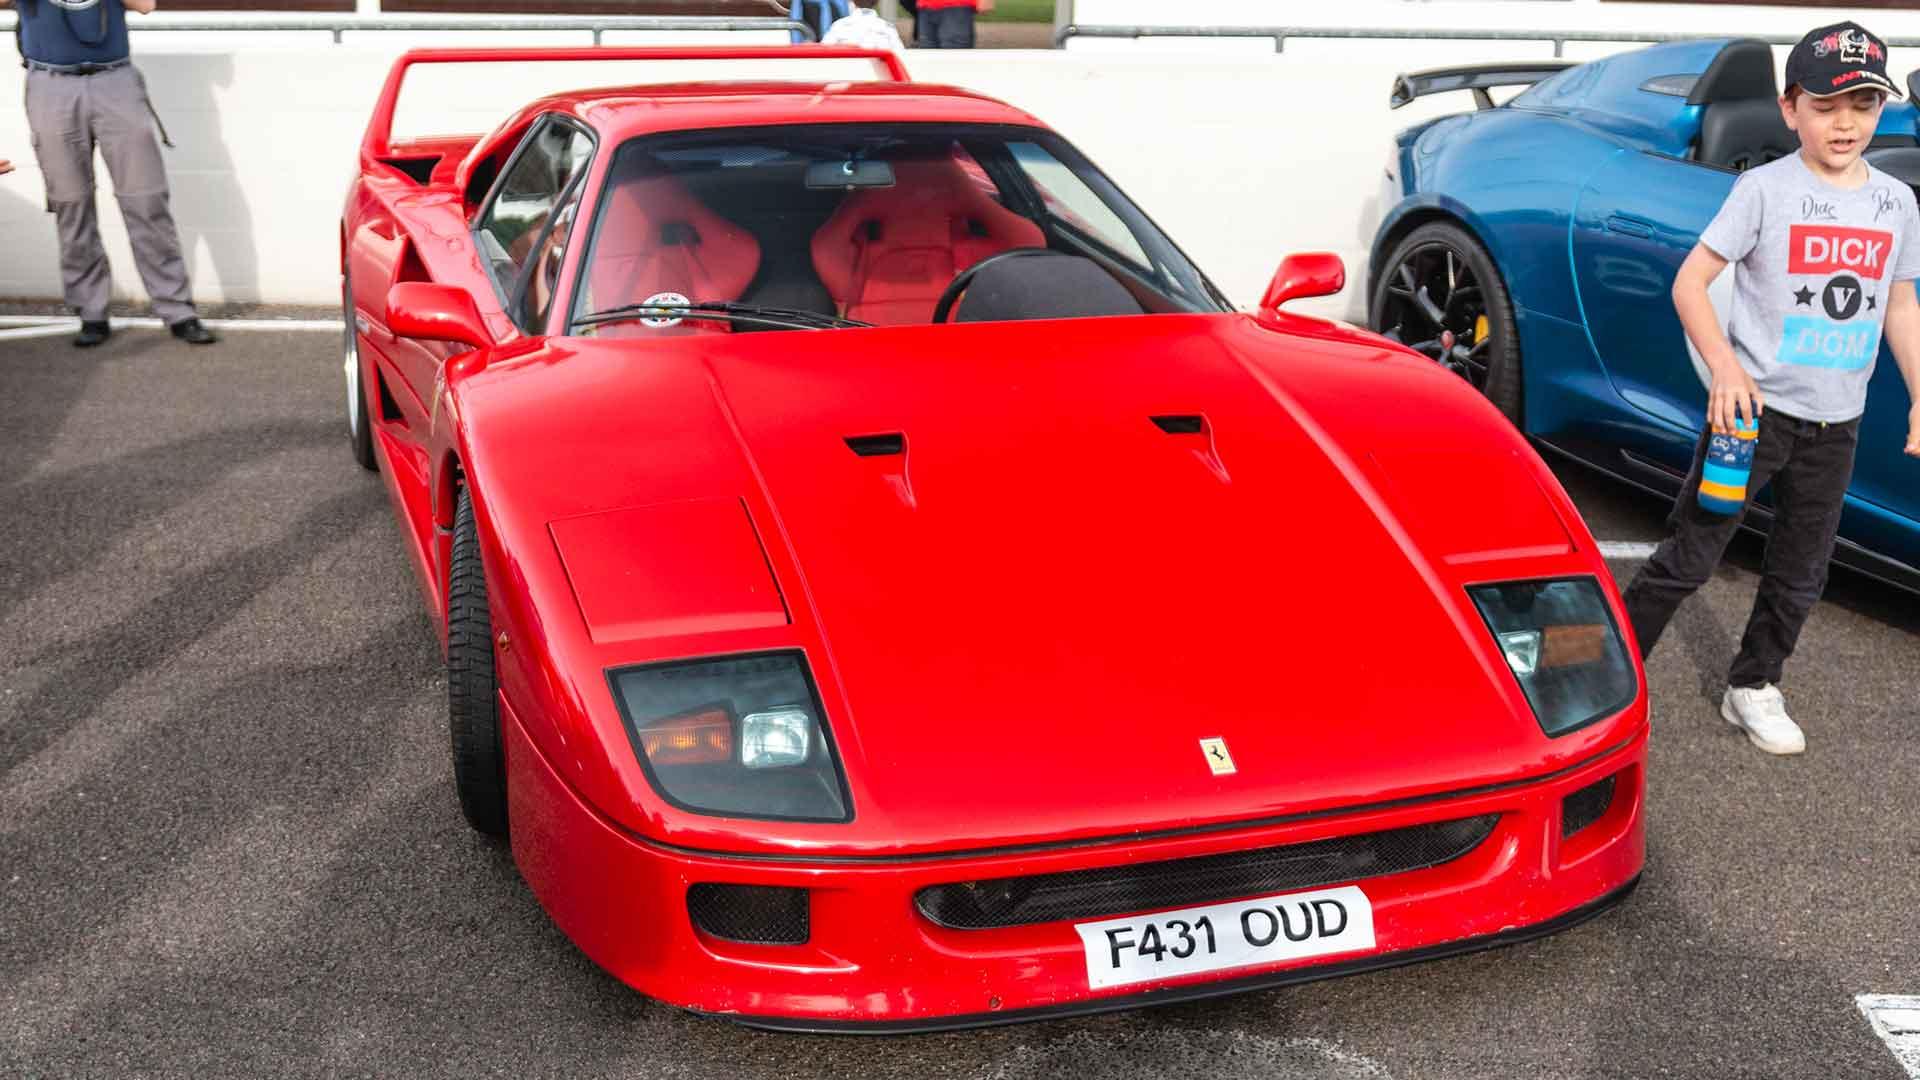 Ferrari F40 at Goodwood Supercar Sunday